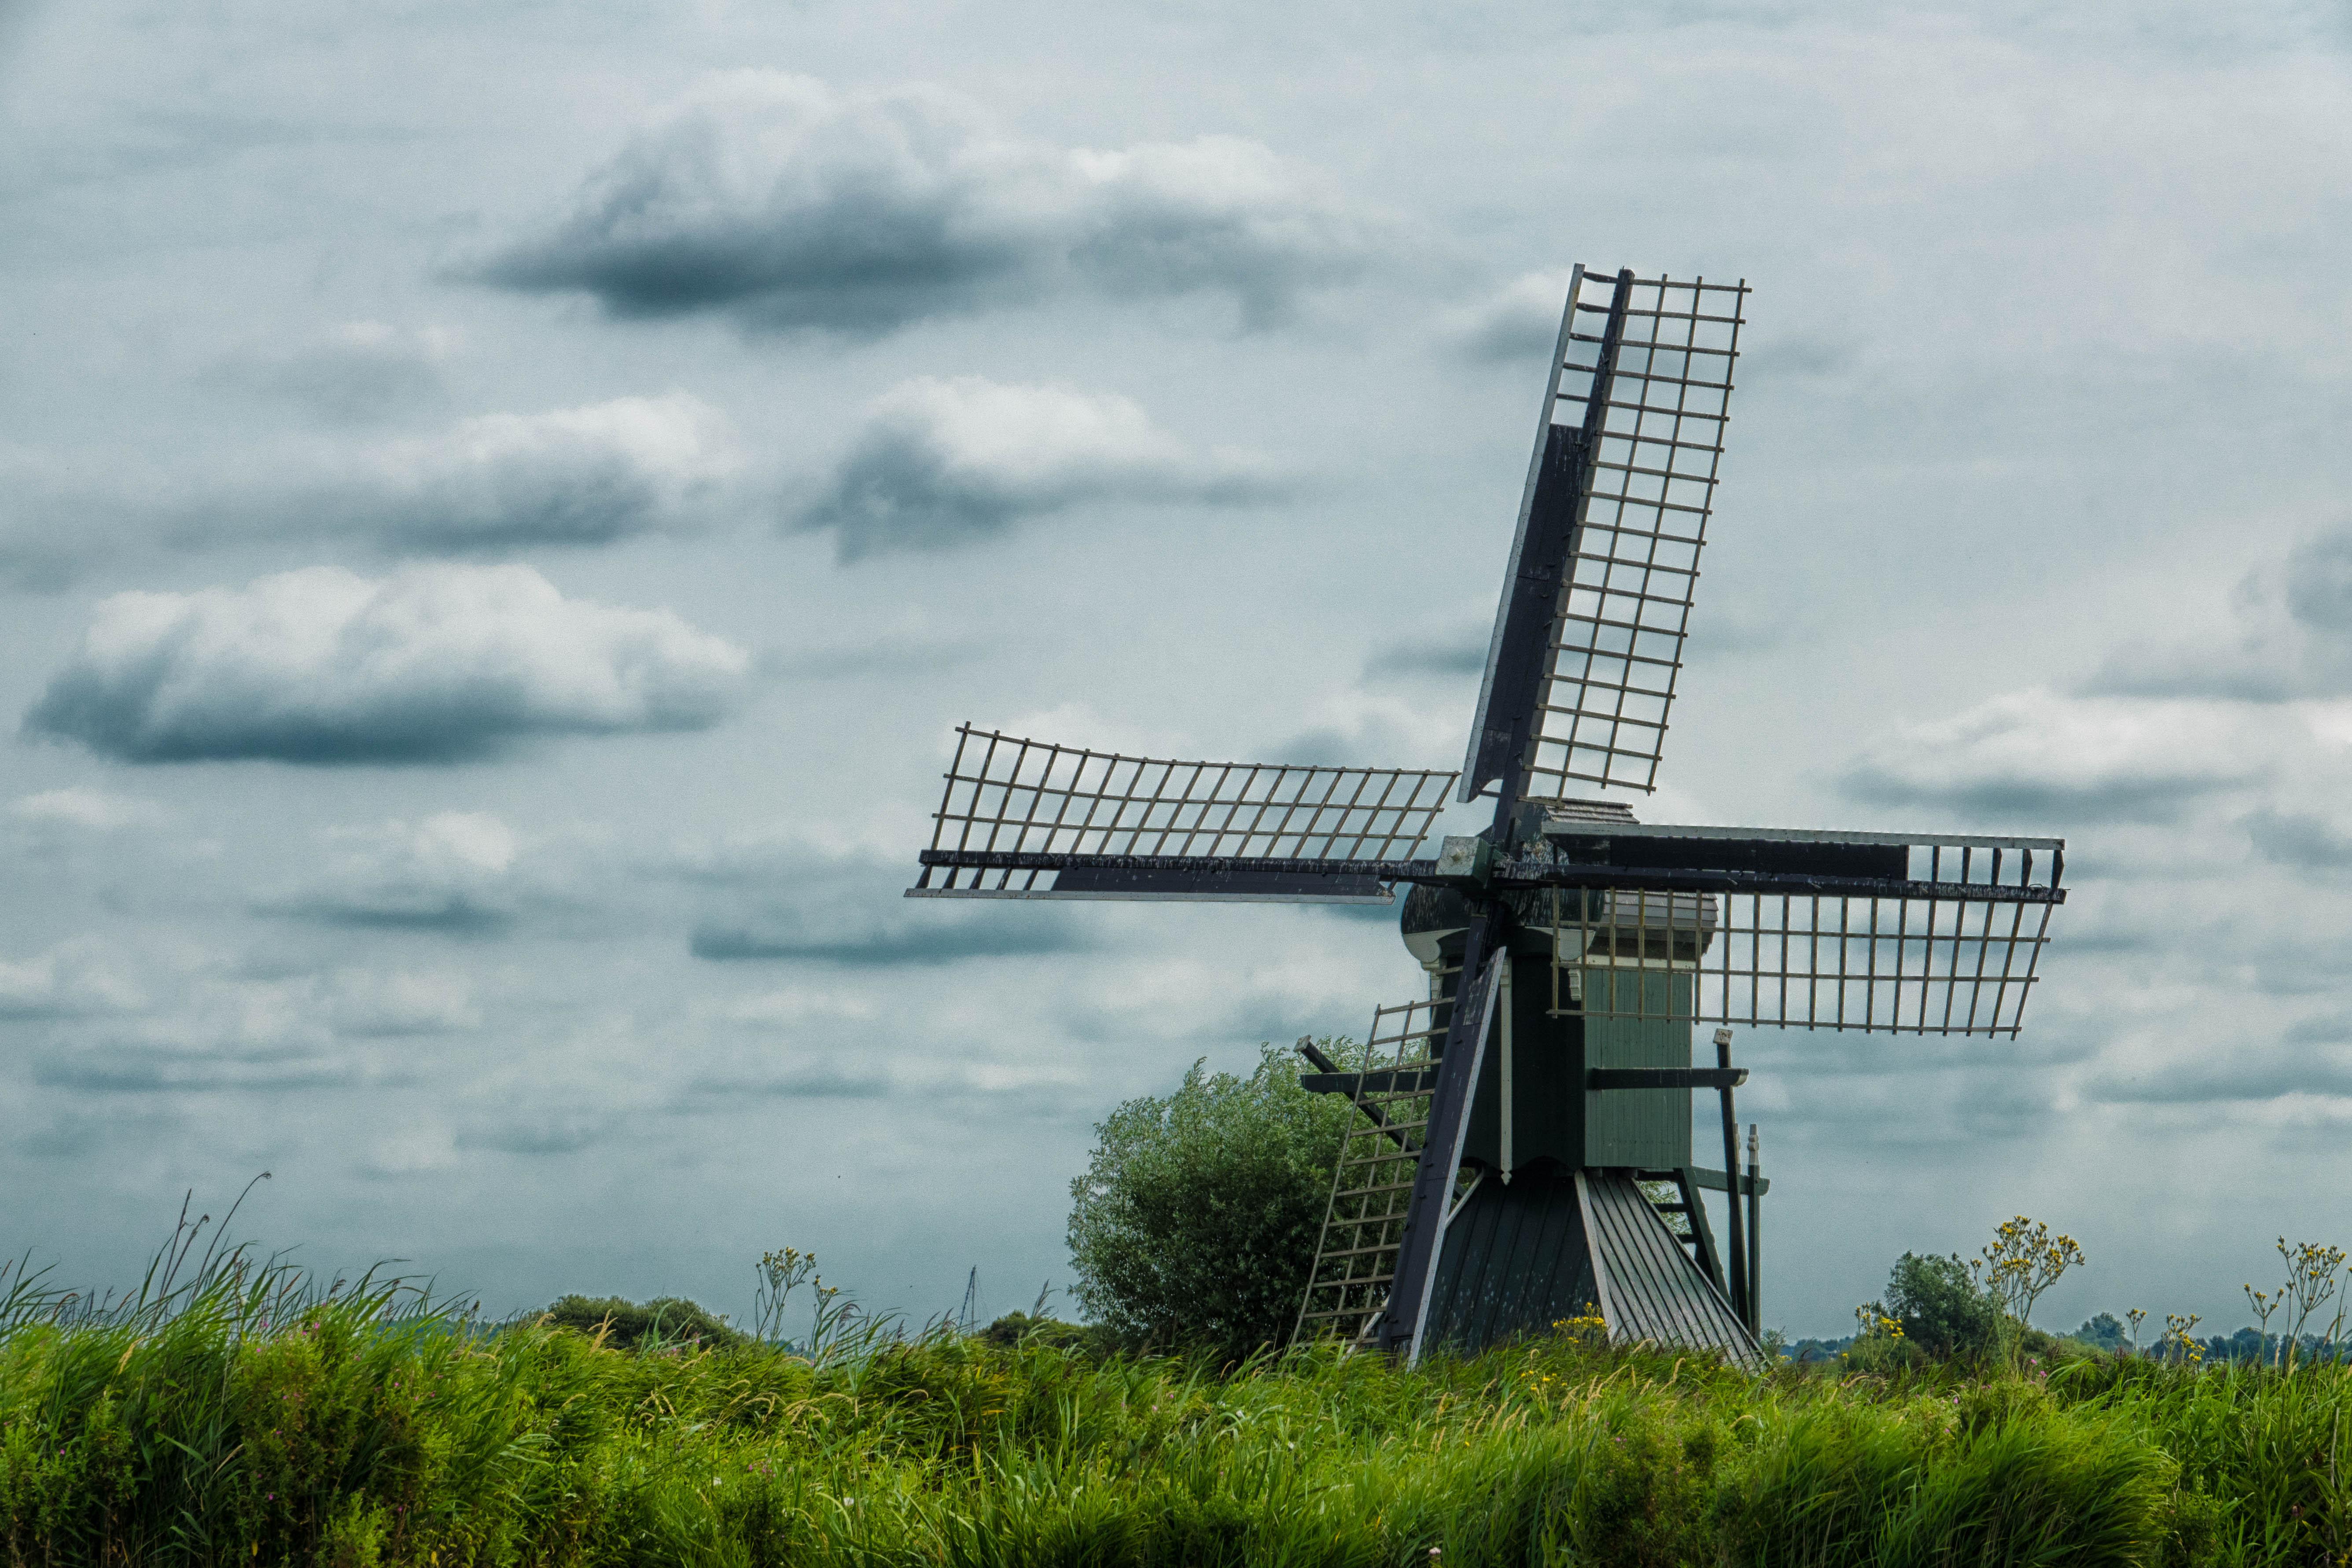 WM-Fotografen, molen in de friese polder